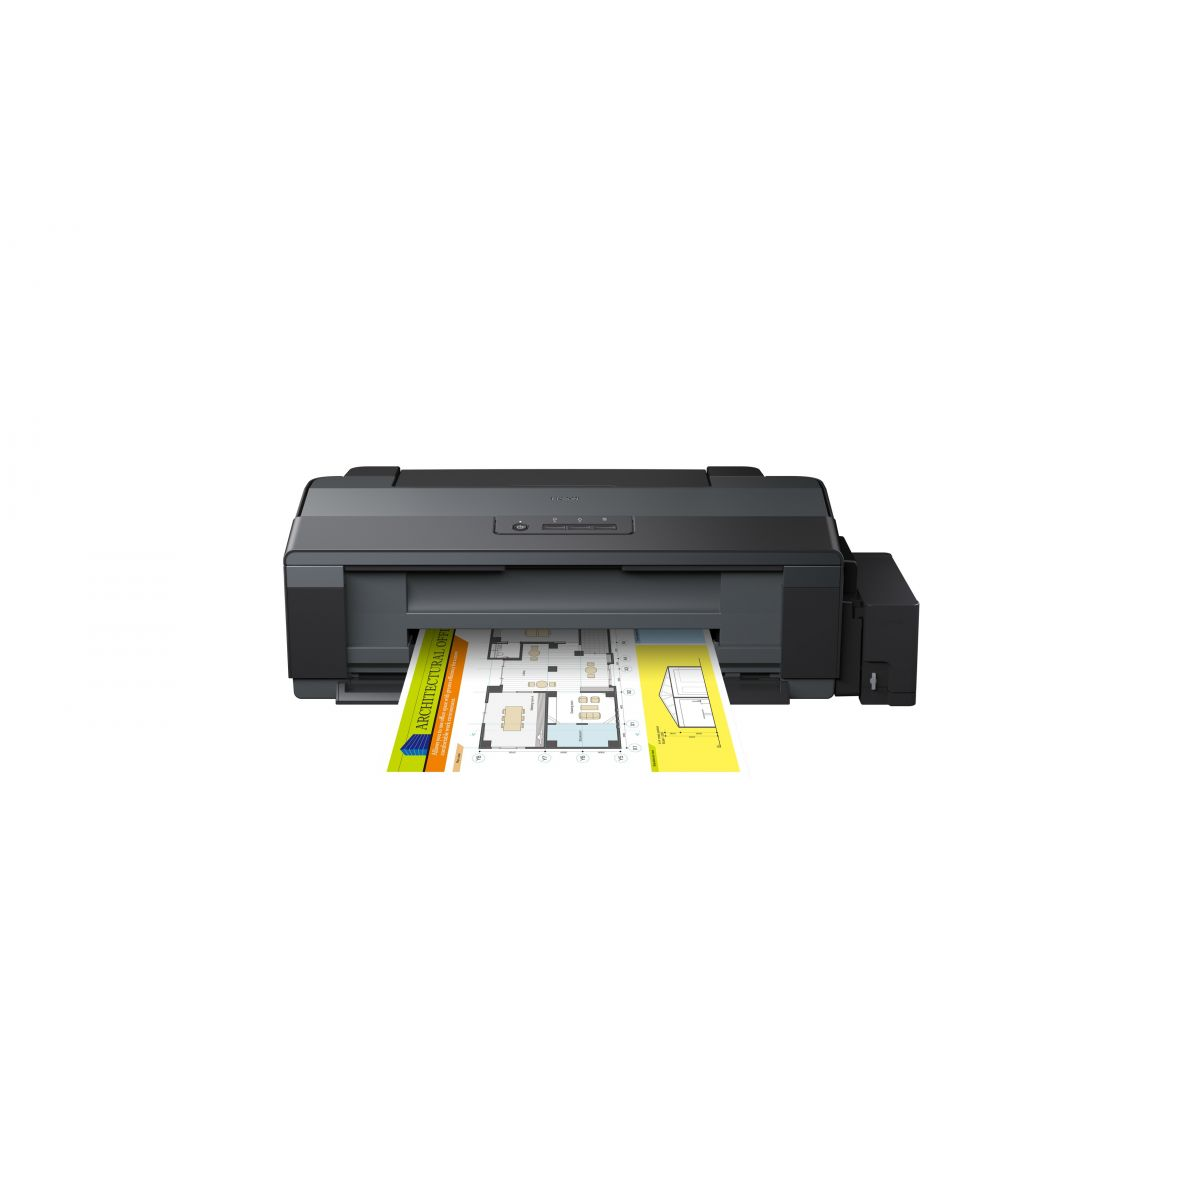 Impressora Epson A3 Tanque de Tinta L1300  - Northshop